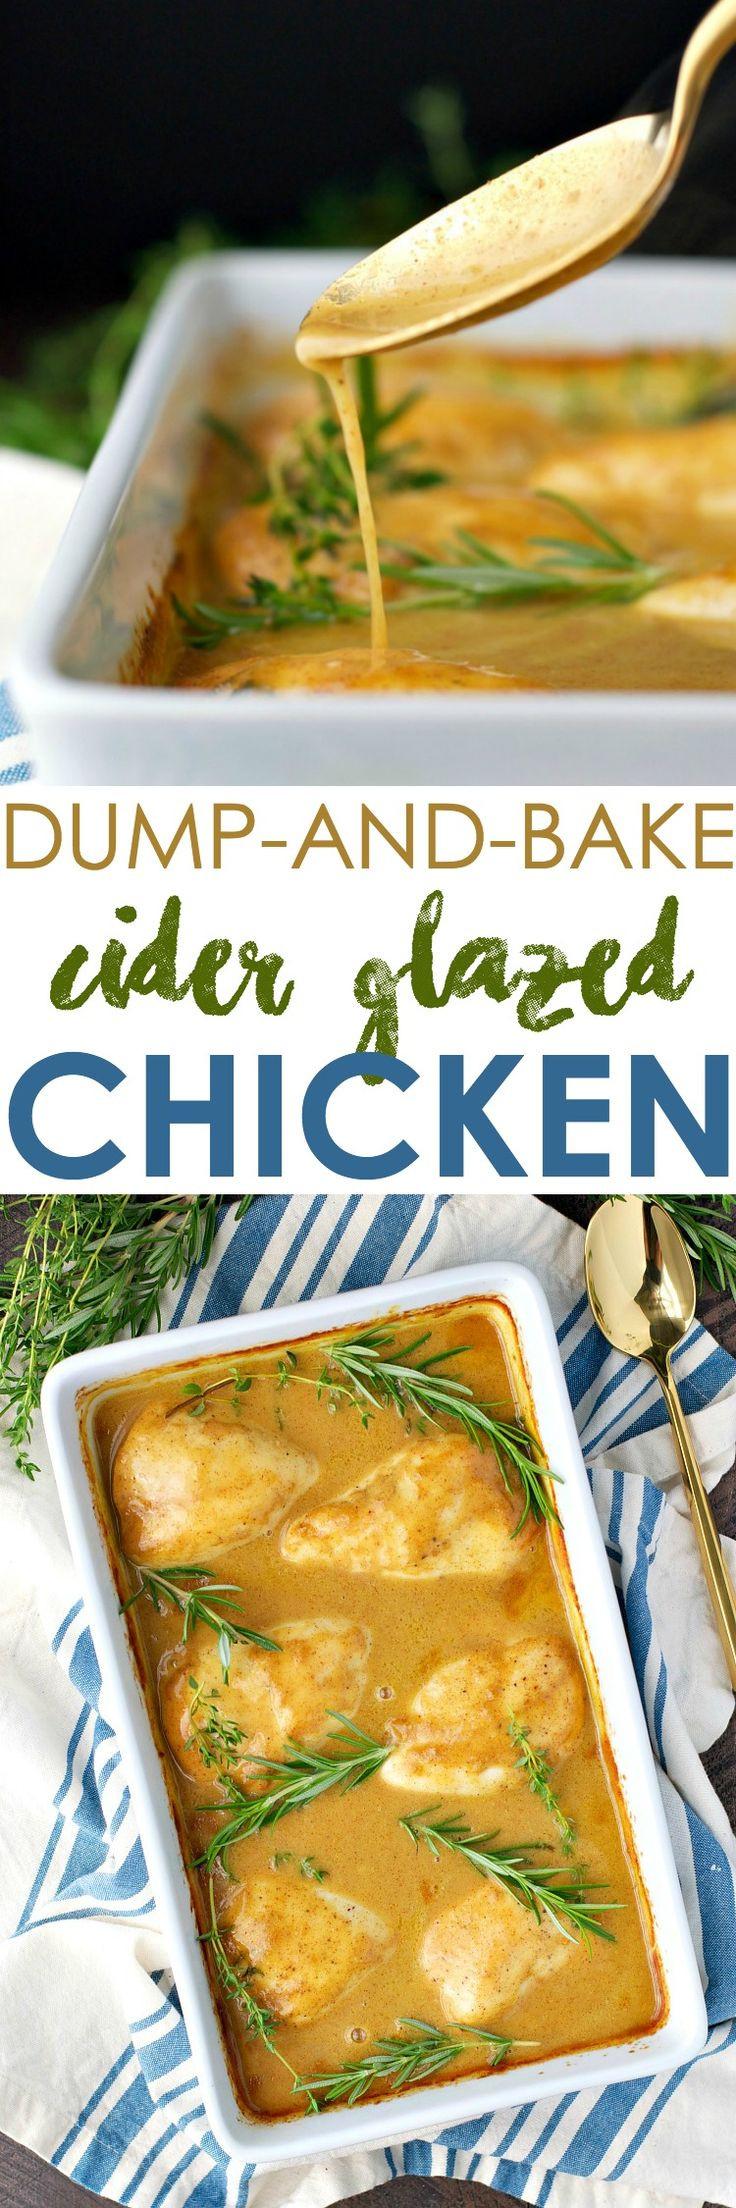 Healthy Dump Dinners  Dump and Bake Cider Glazed Chicken Recipe